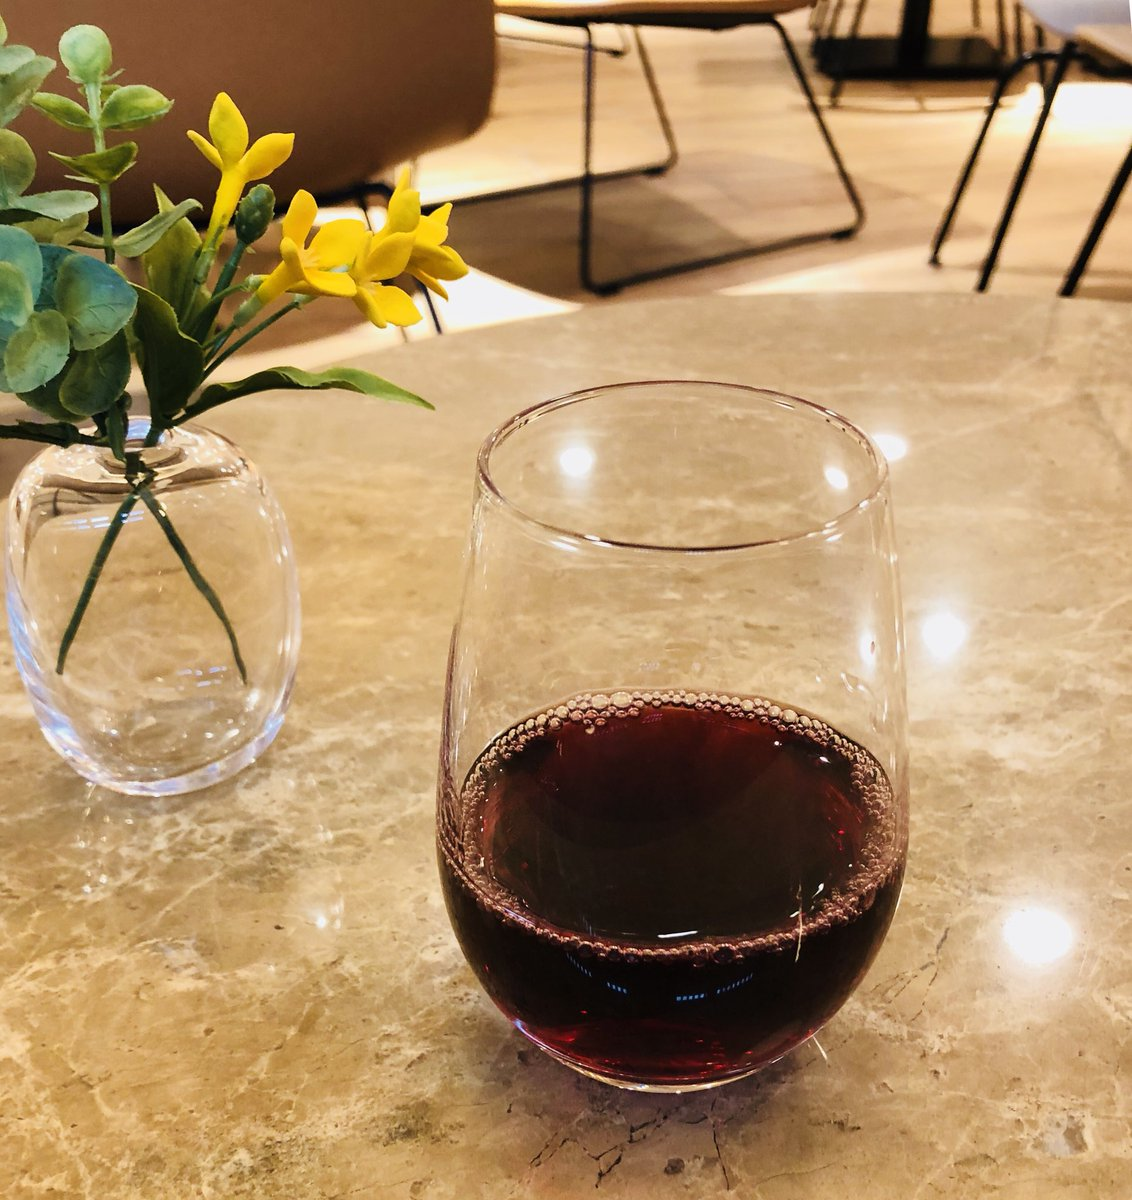 test ツイッターメディア - 泊まったホテル、宿泊サービスで佐々木酒造か丹波ワインを一杯いただけて素敵だった。朝食も客室も良くてお手頃価格だしまた泊まりたい。 https://t.co/IE6ZRRHFty